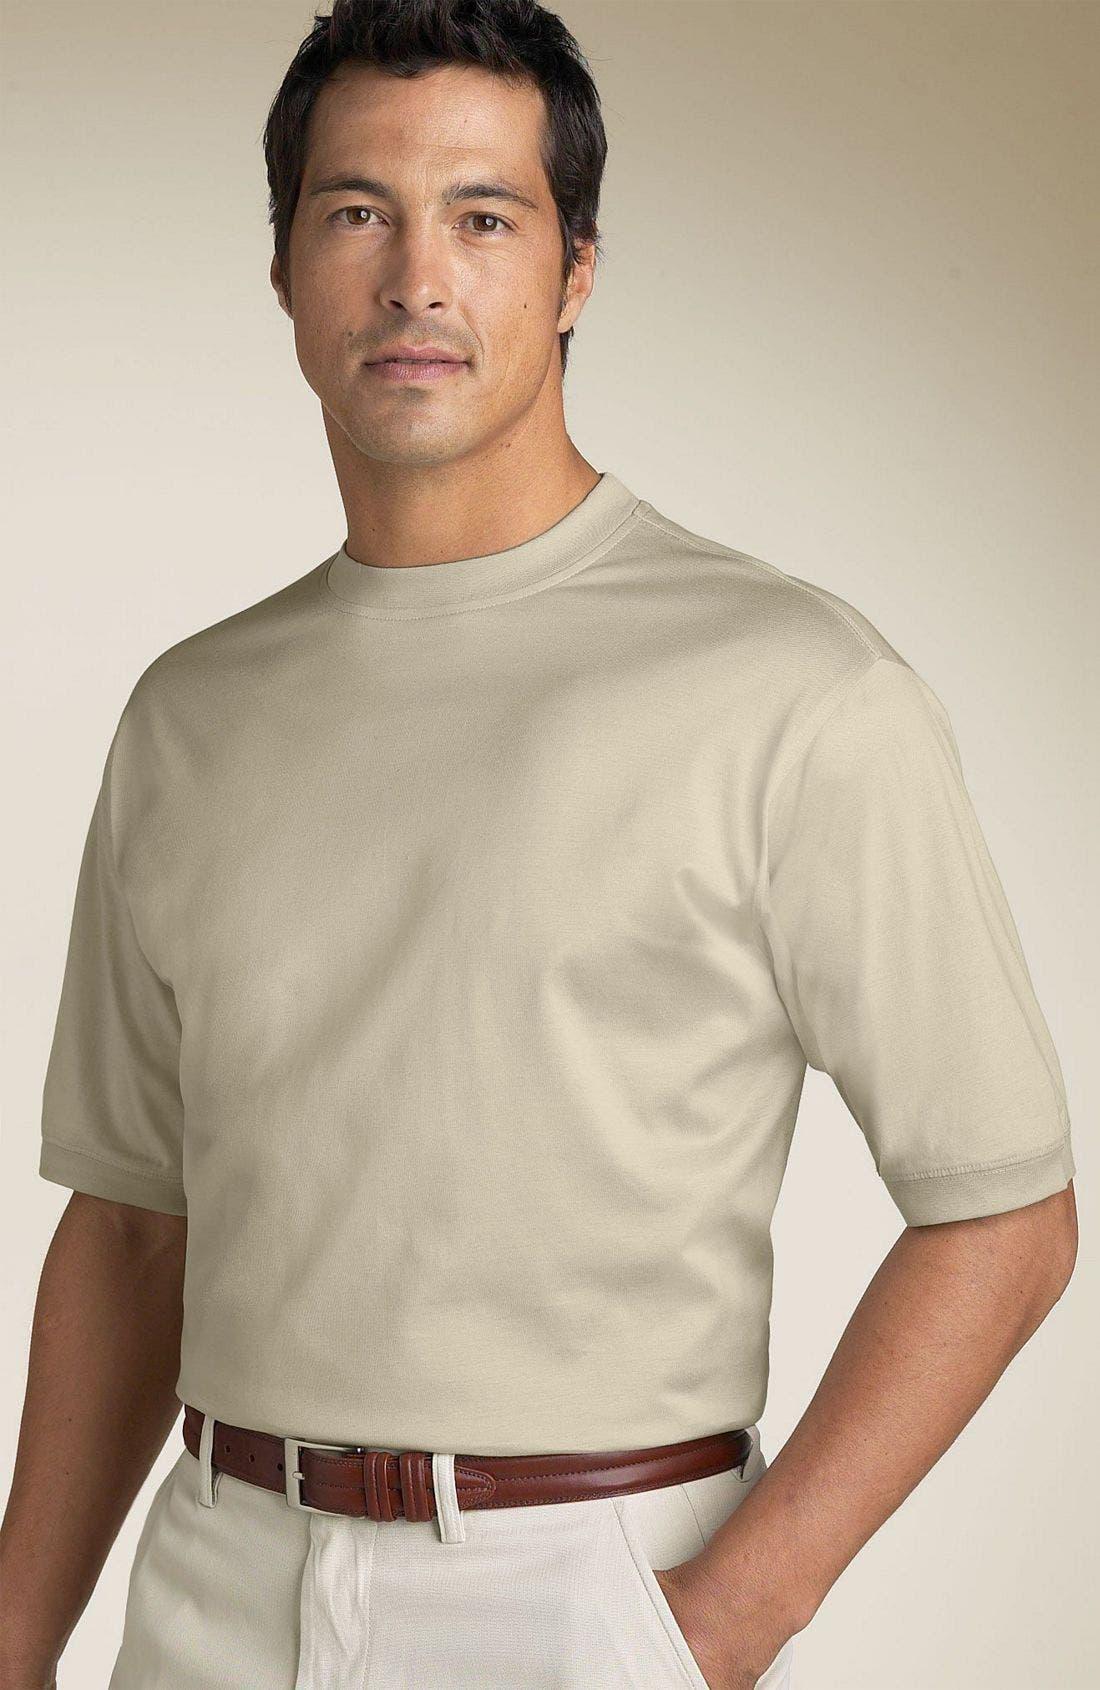 Alternate Image 1 Selected - Tricots St. Raphael® Mercerized Cotton T-Shirt